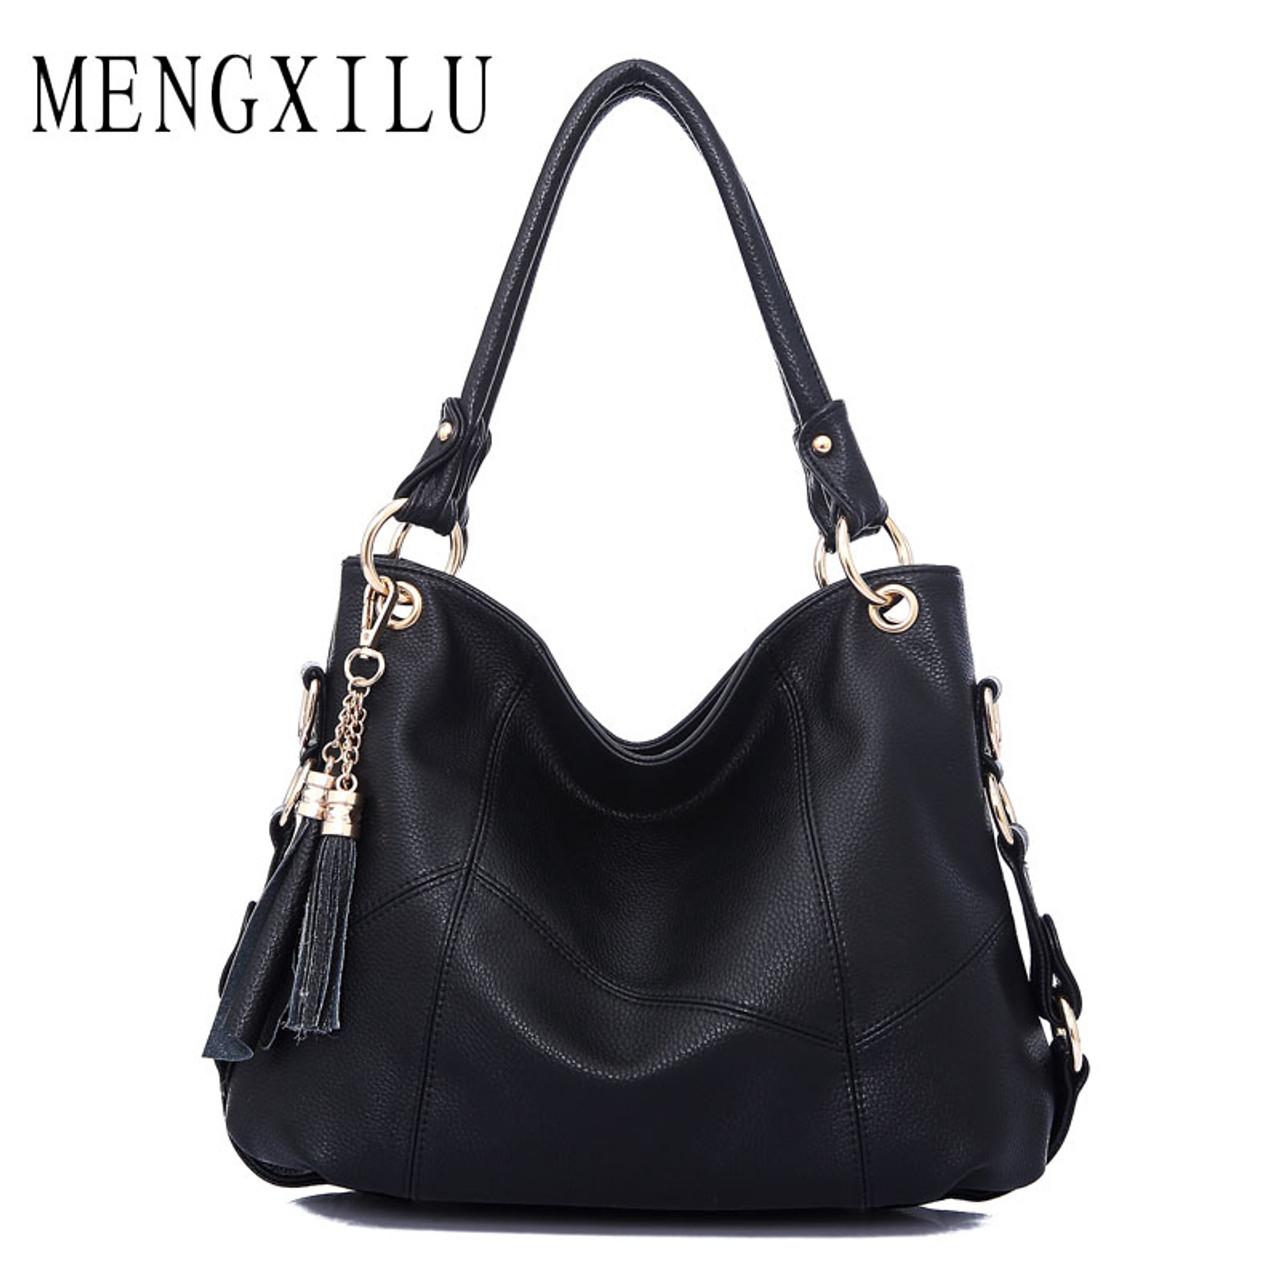 cdeb60a4689b Large Leather Tote Bag Women Shoulder Bags Women Handbags 2017 Tassel Hobo  Luxury Handbags Women Bags Designer High Quality Sac - OnshopDeals.Com